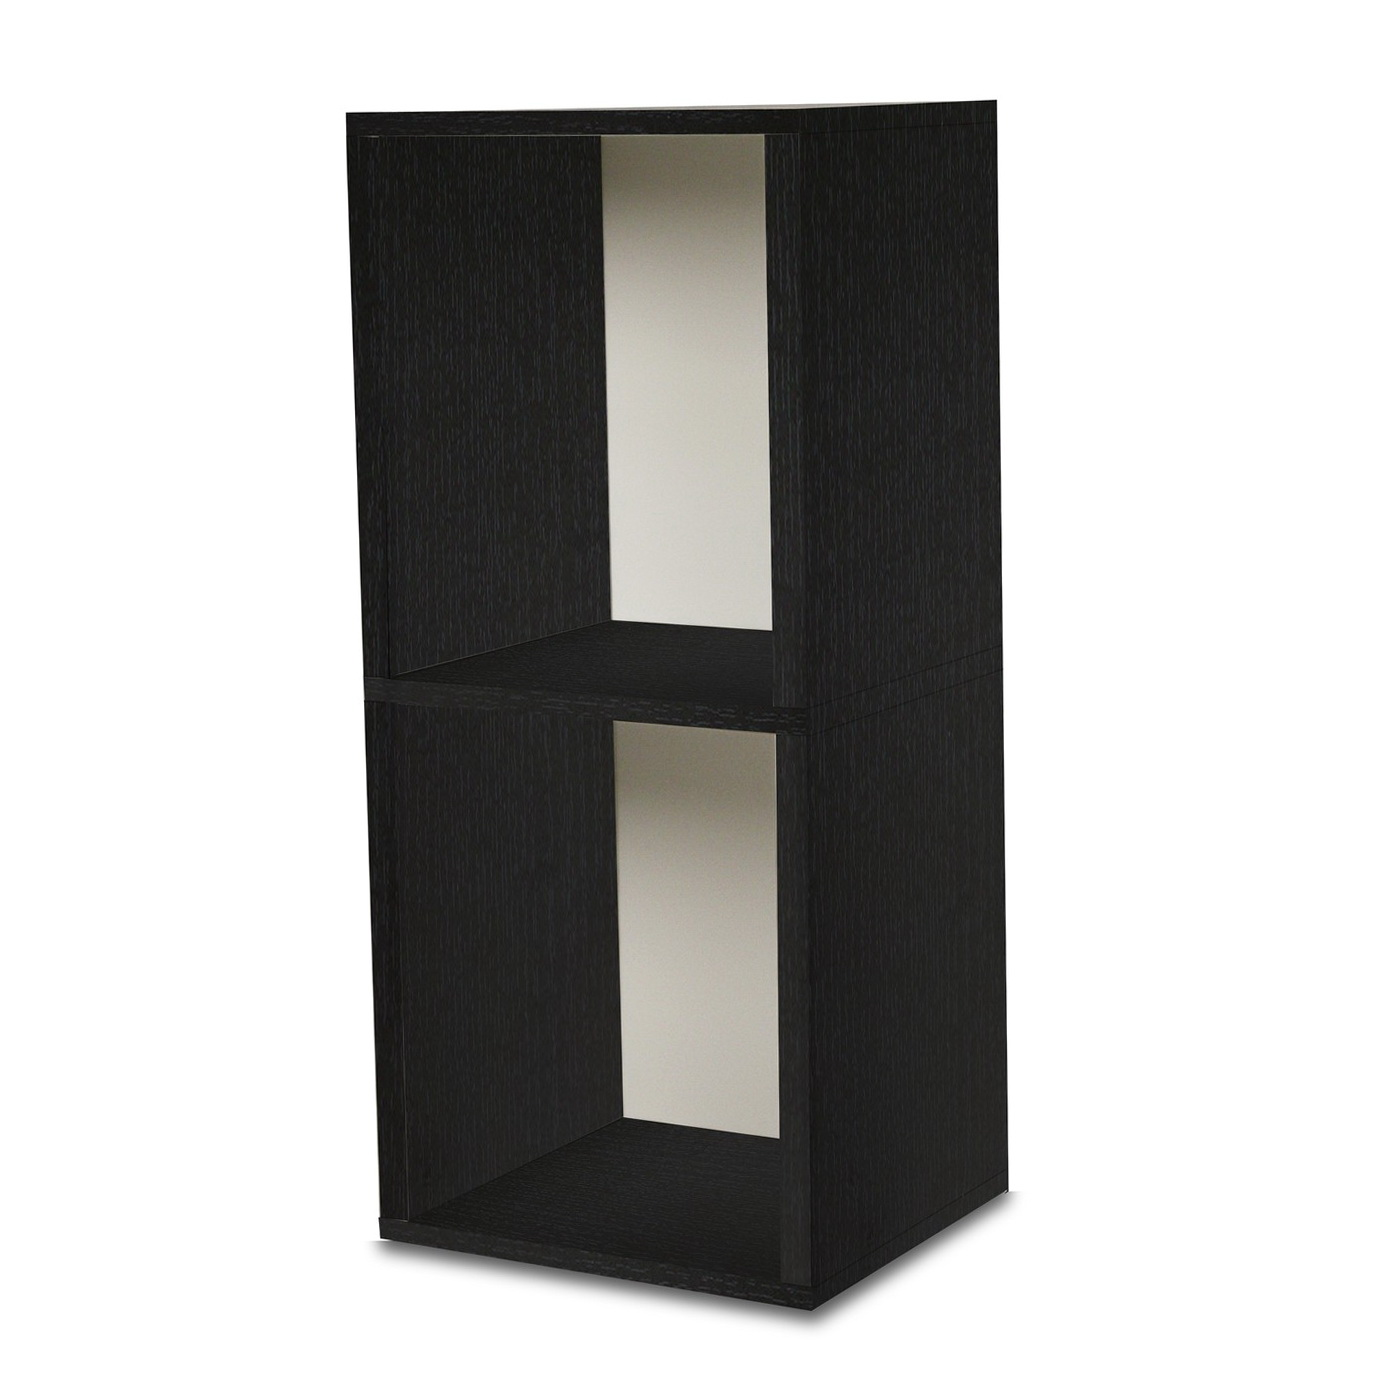 Black Two Shelf Bookcase